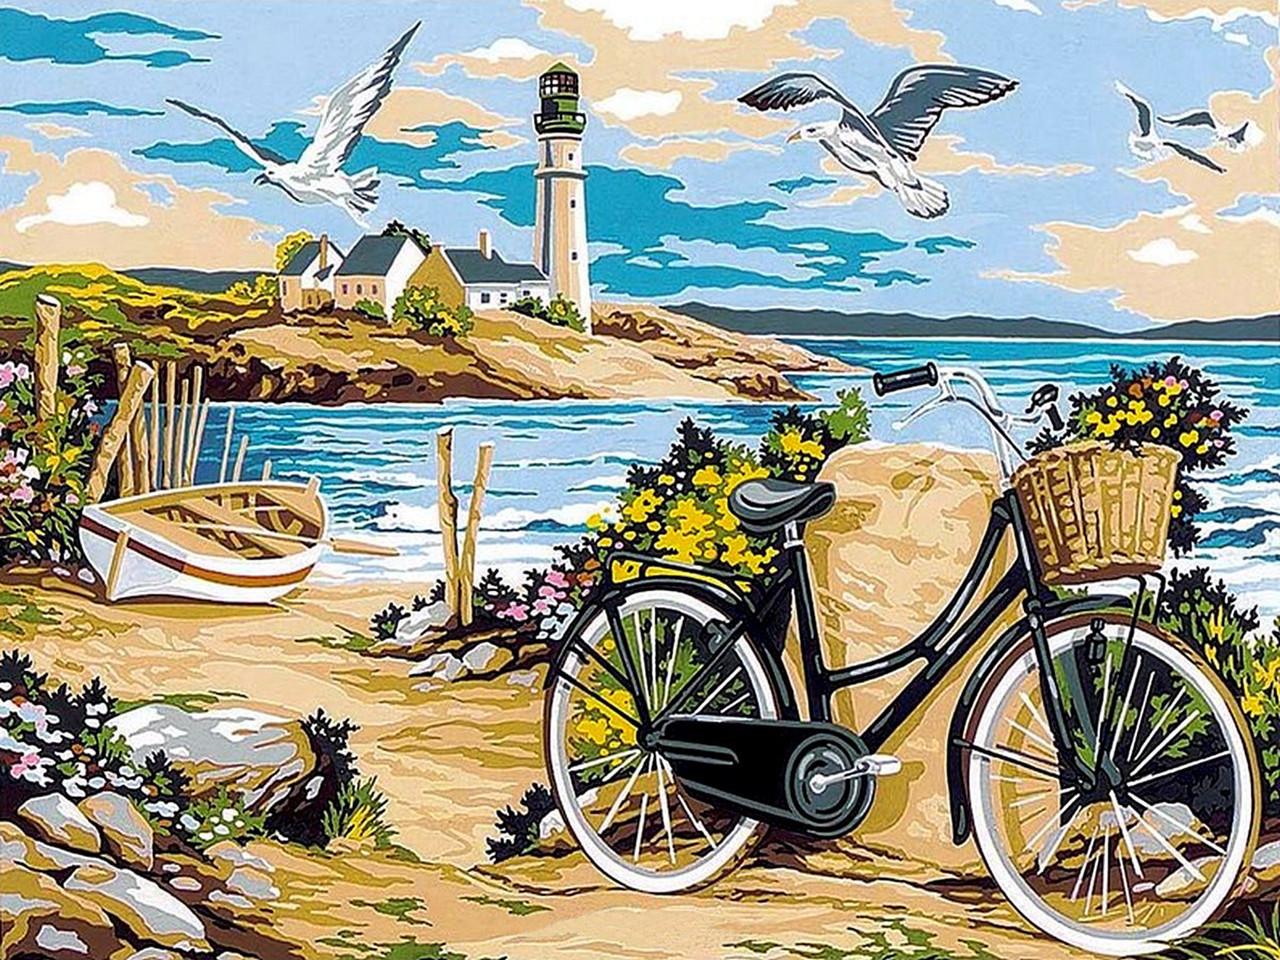 VK052 Раскраска по номерам Прогулка по пляжу